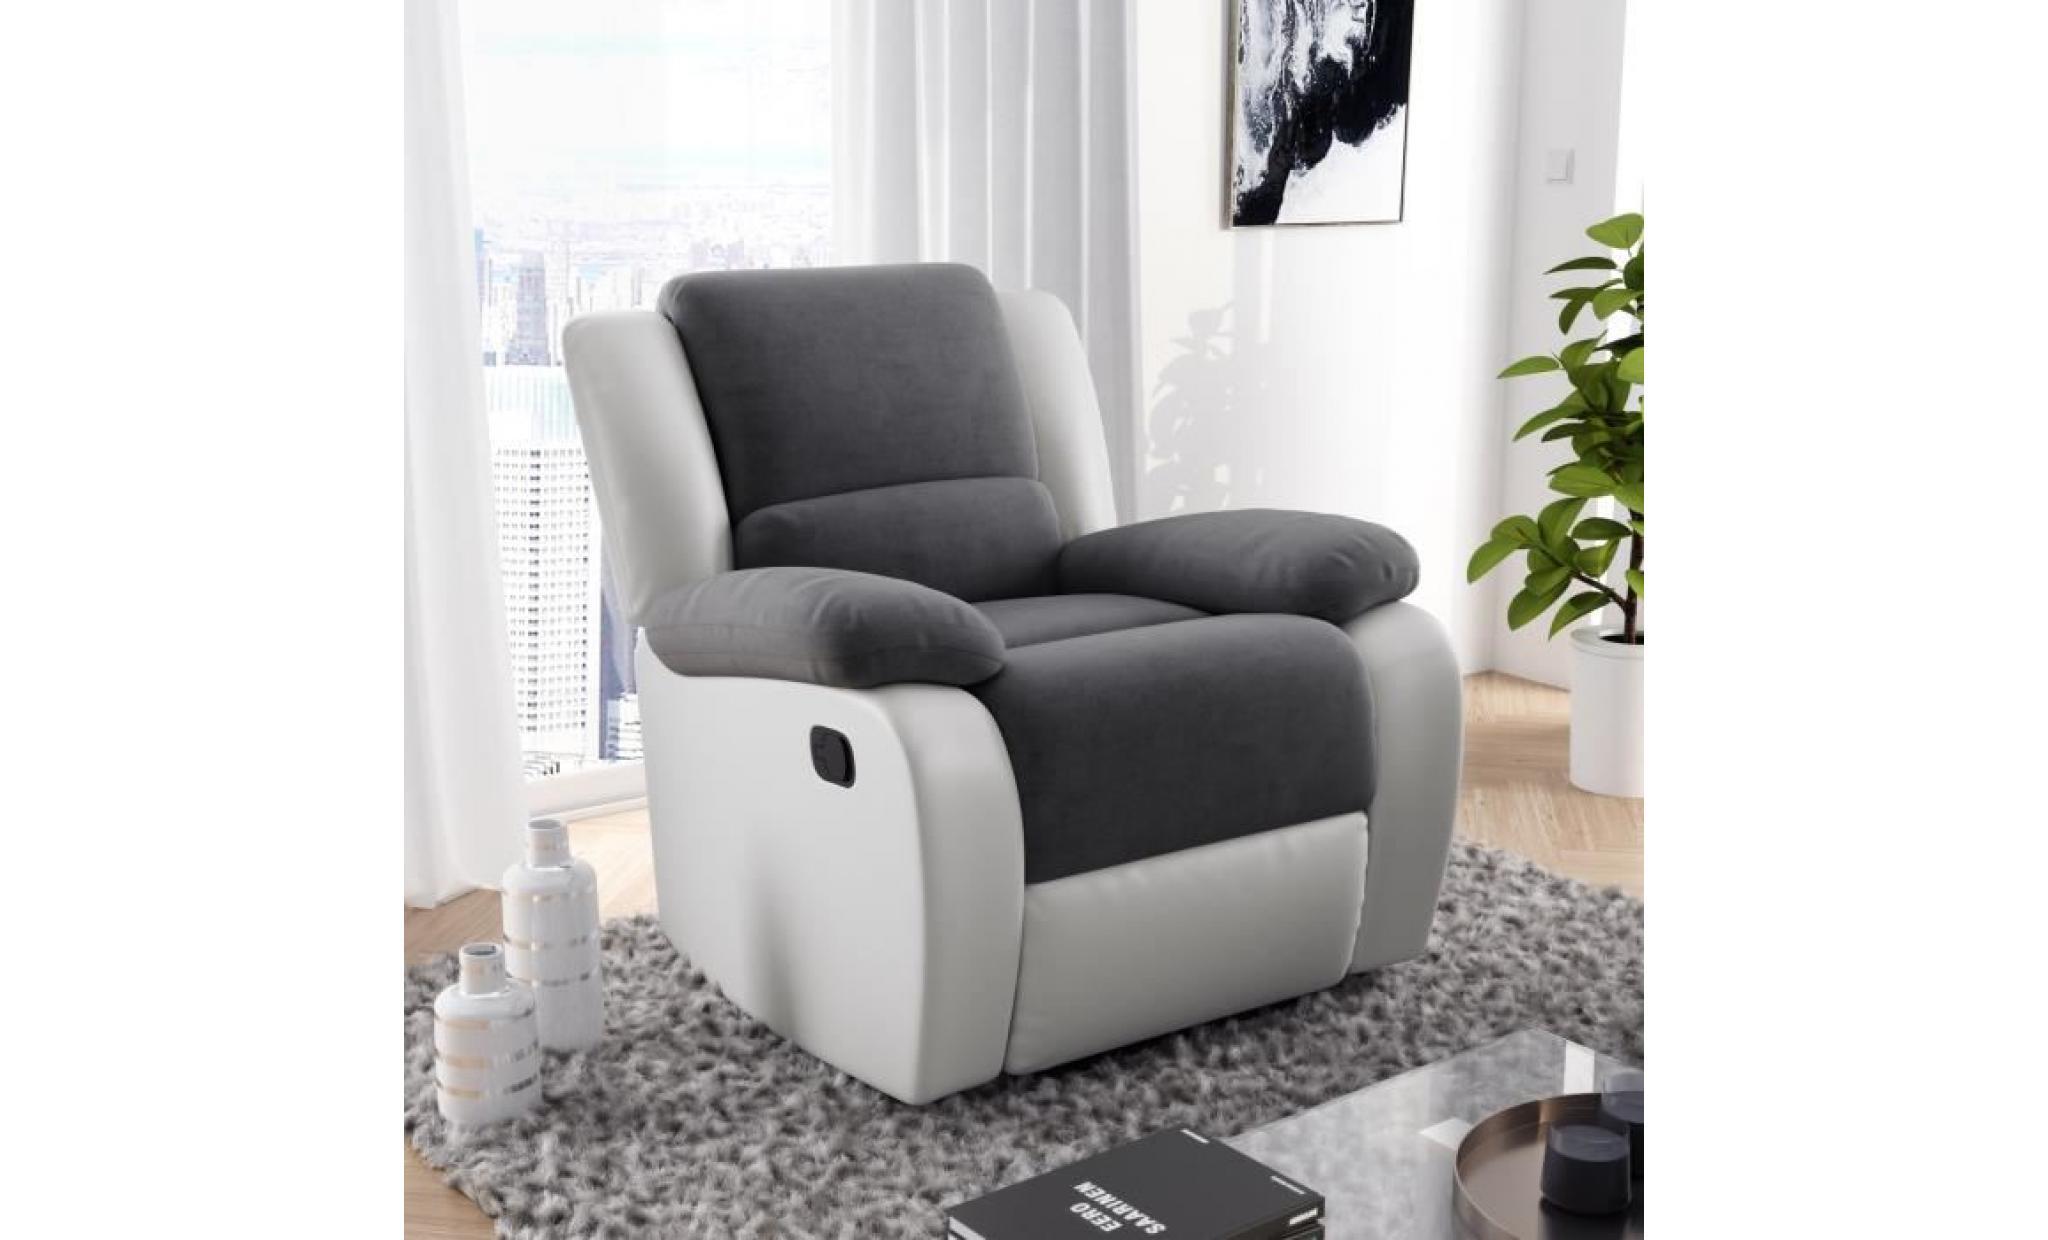 Relax Fauteuil Design.Relax Fauteuil Relaxation Simili Et Tissu Blanc Et Gris Style